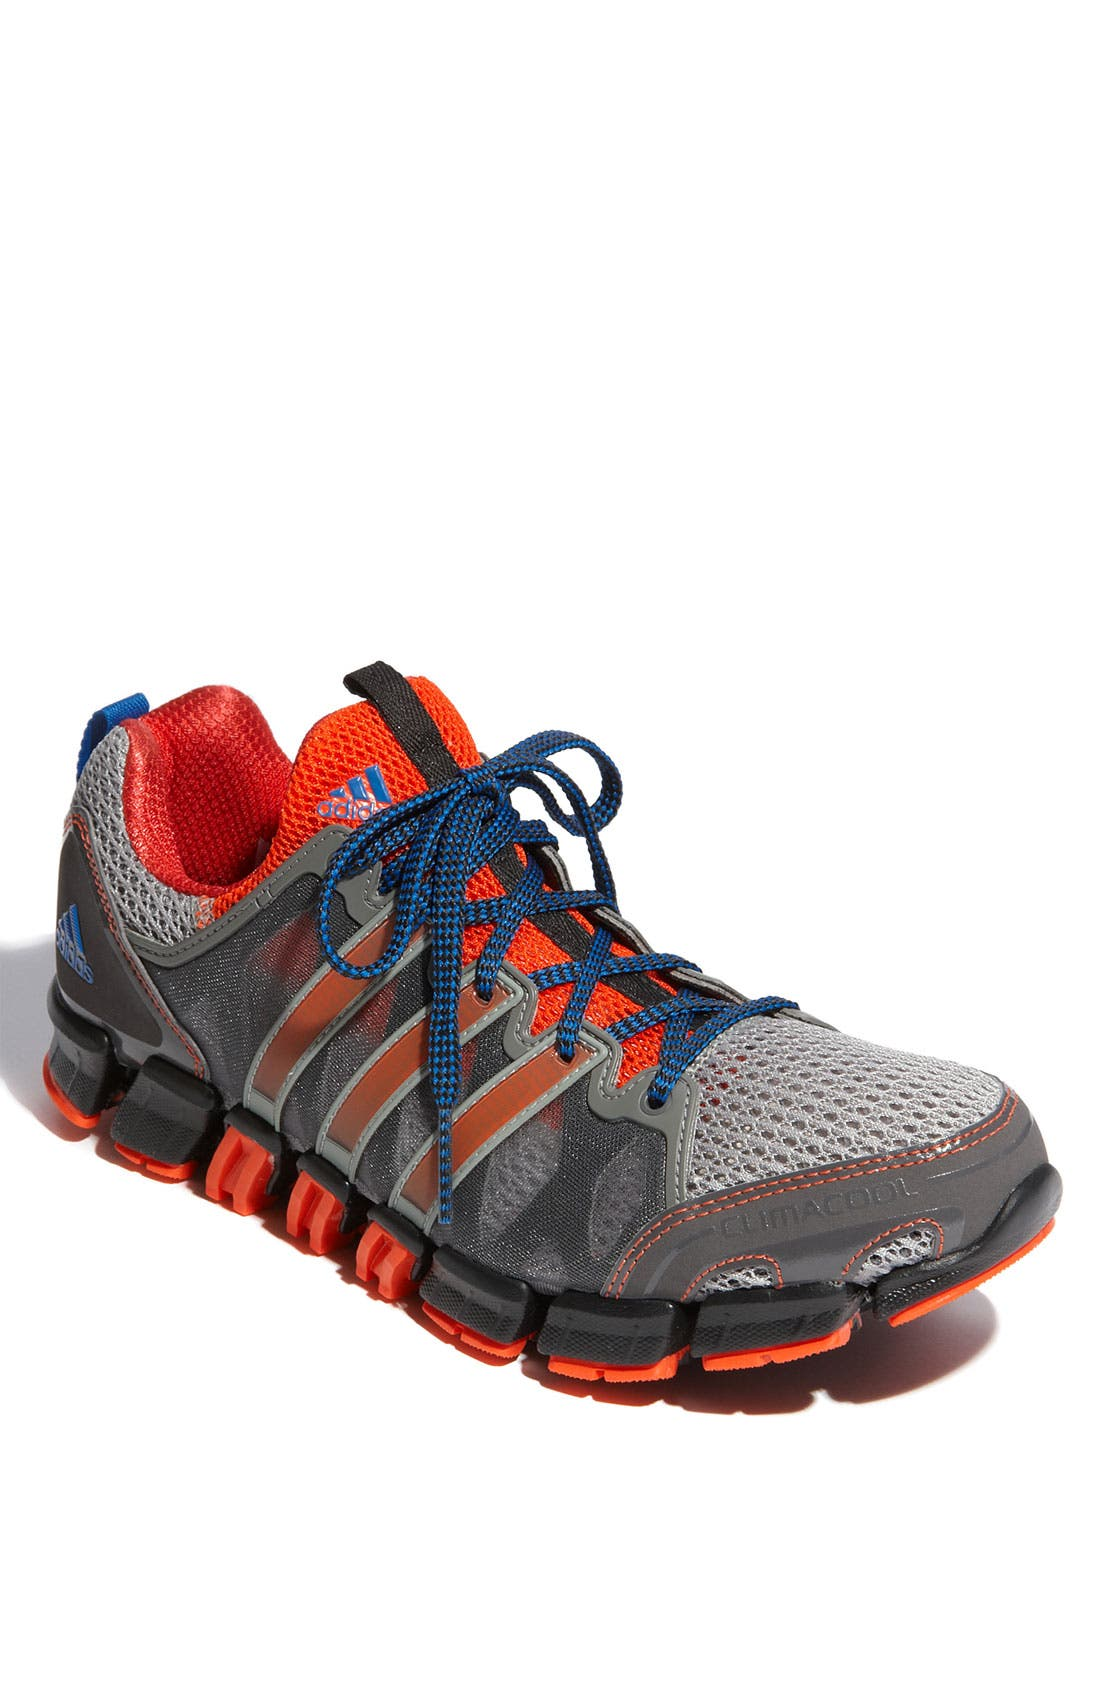 Main Image - adidas 'CLIMA Ride' Trail Running Shoe (Men)